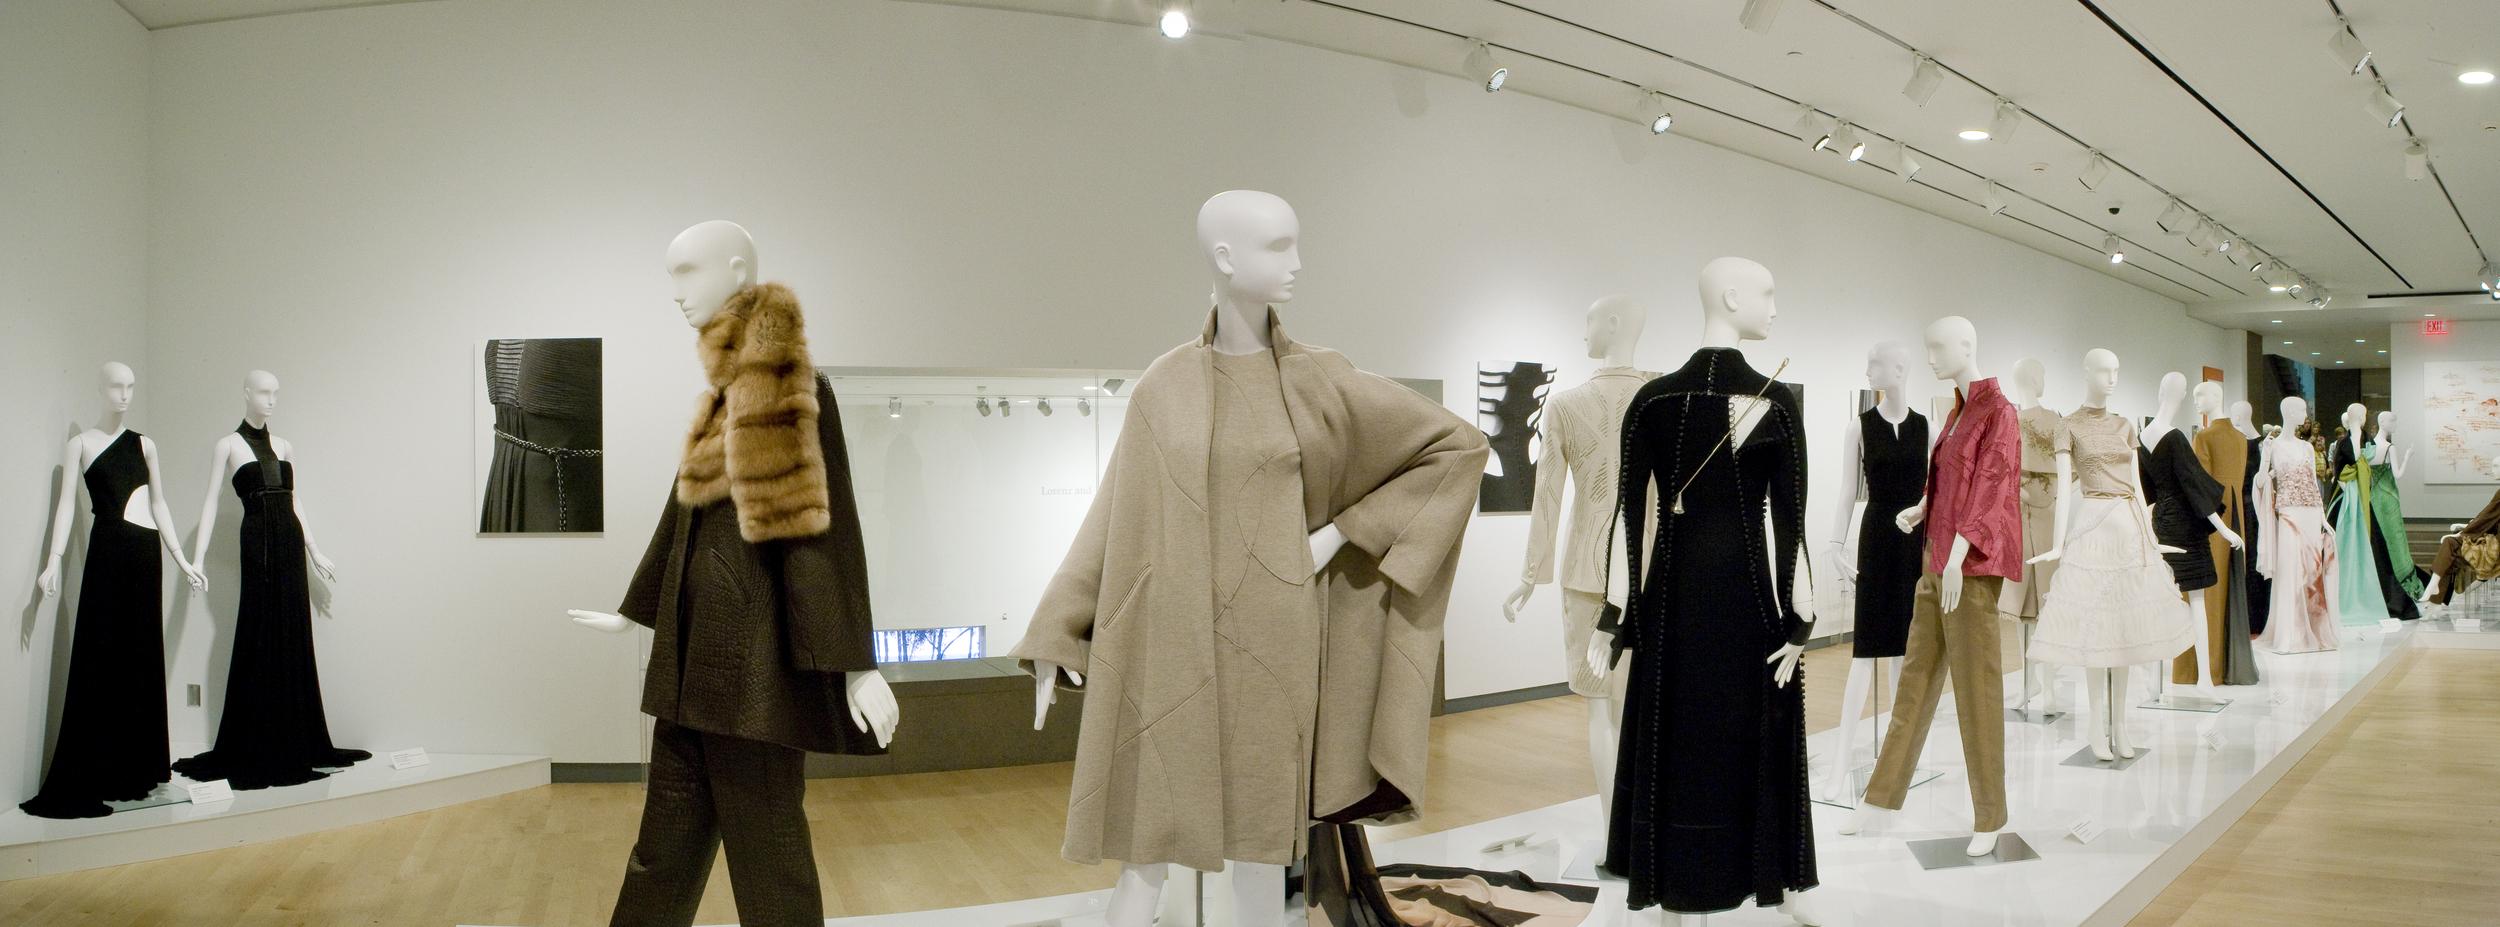 exhibition+2.jpg